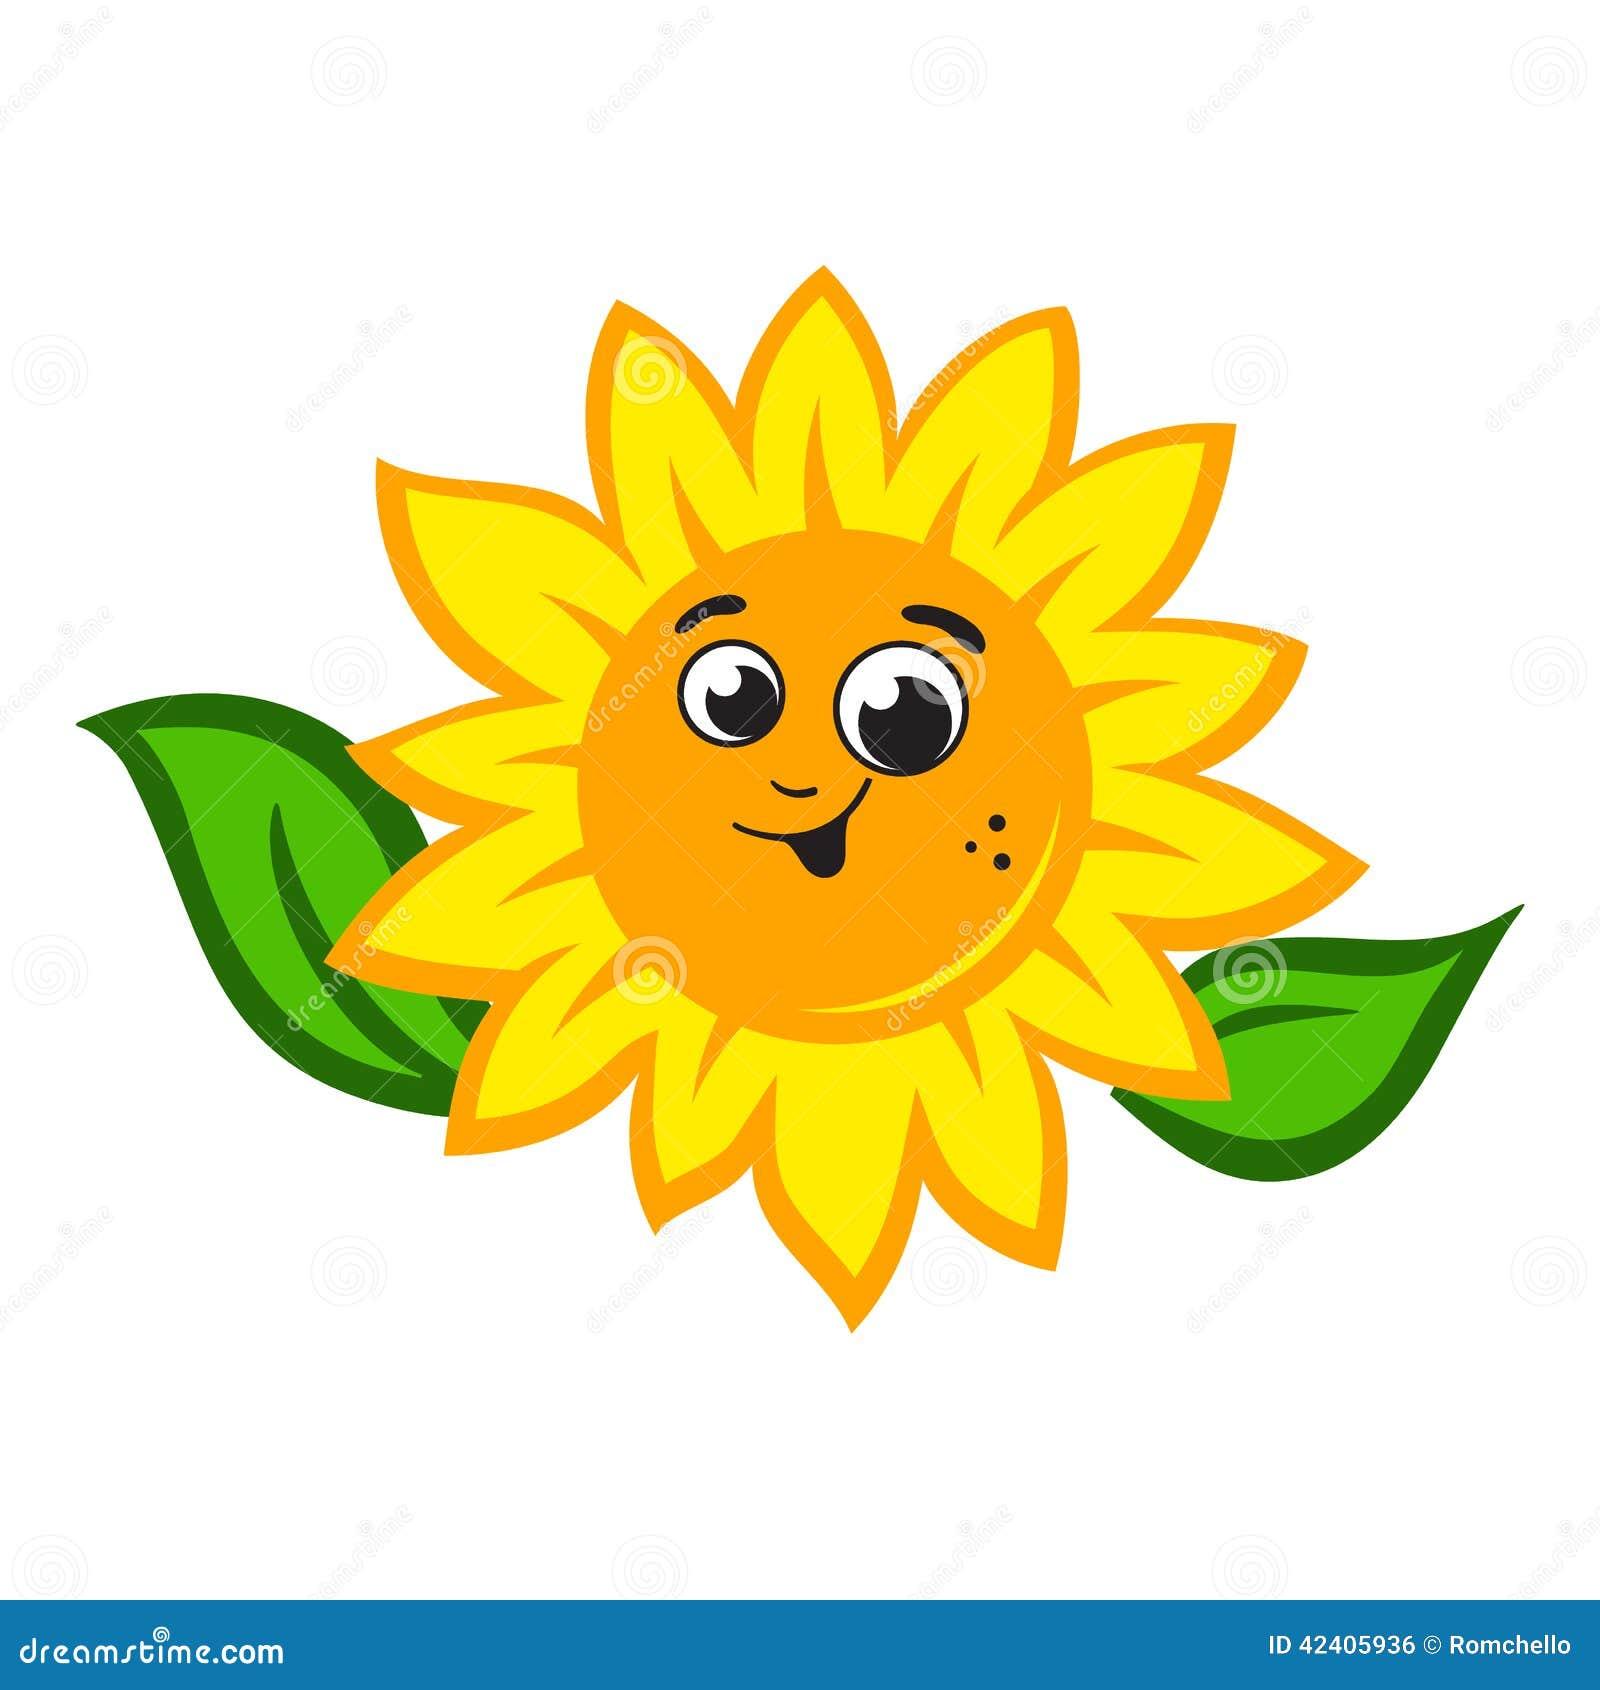 Sunflower logo stock illustration. Illustration of ...